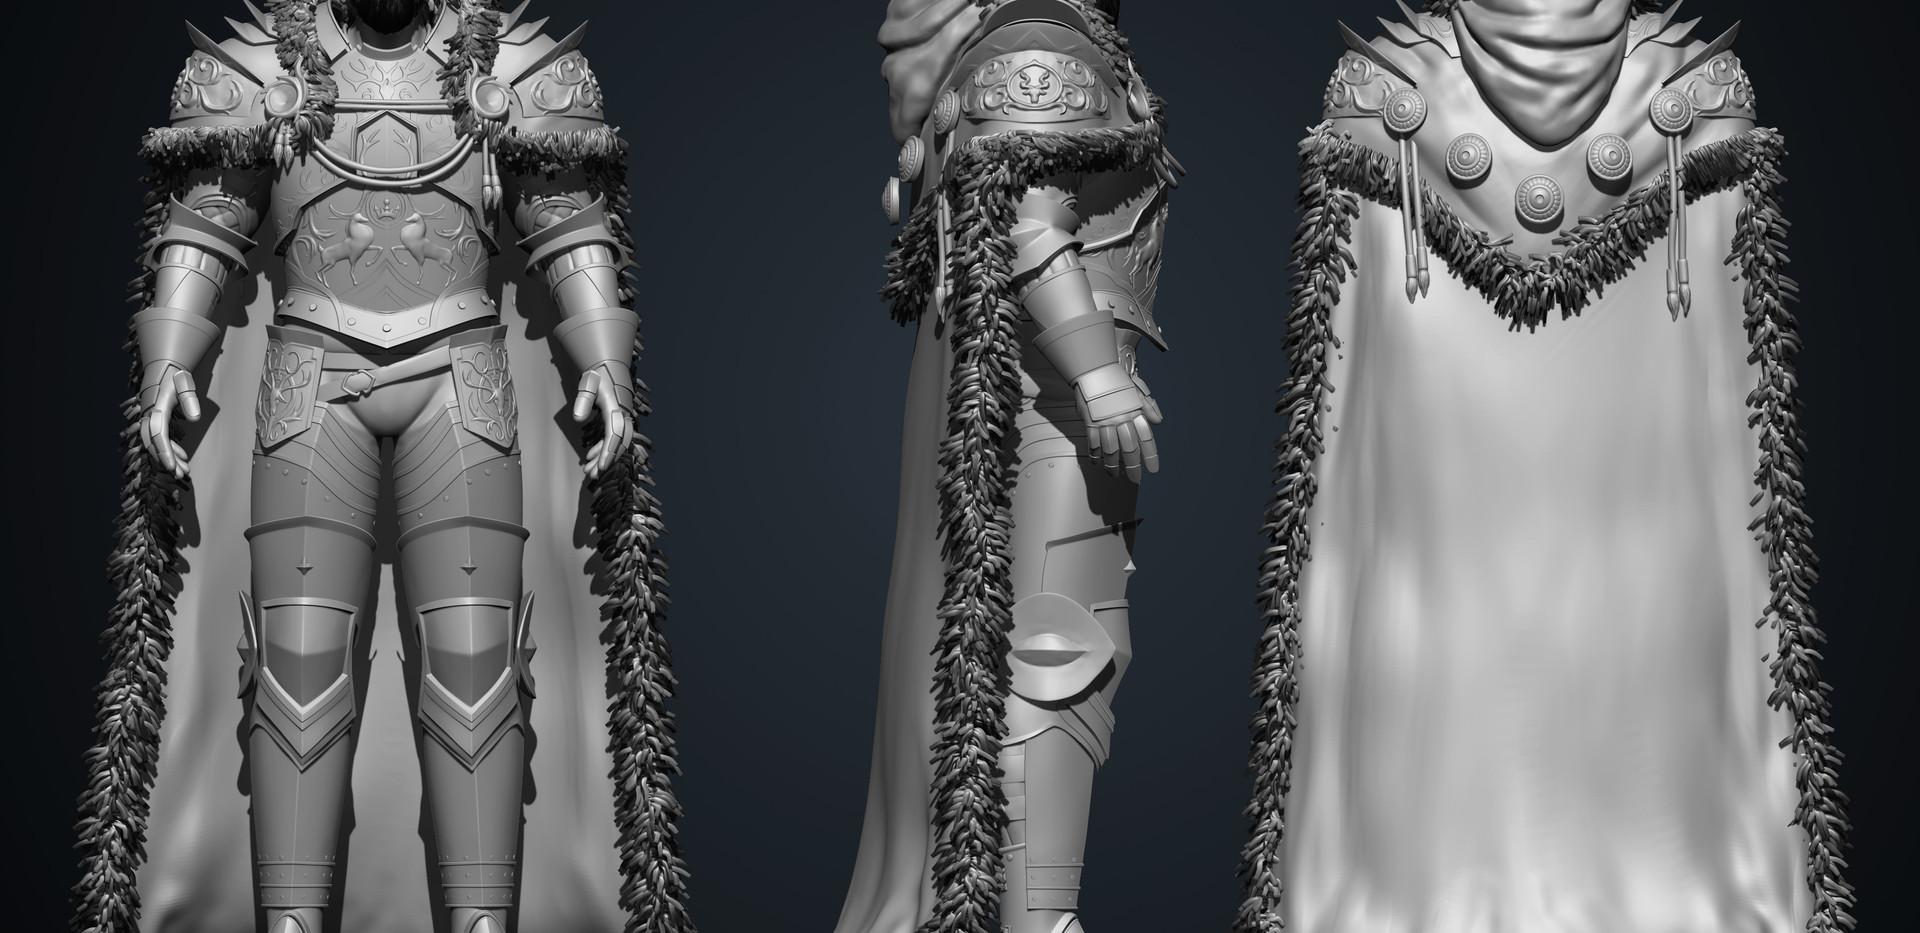 knight_without_helmet.jpg